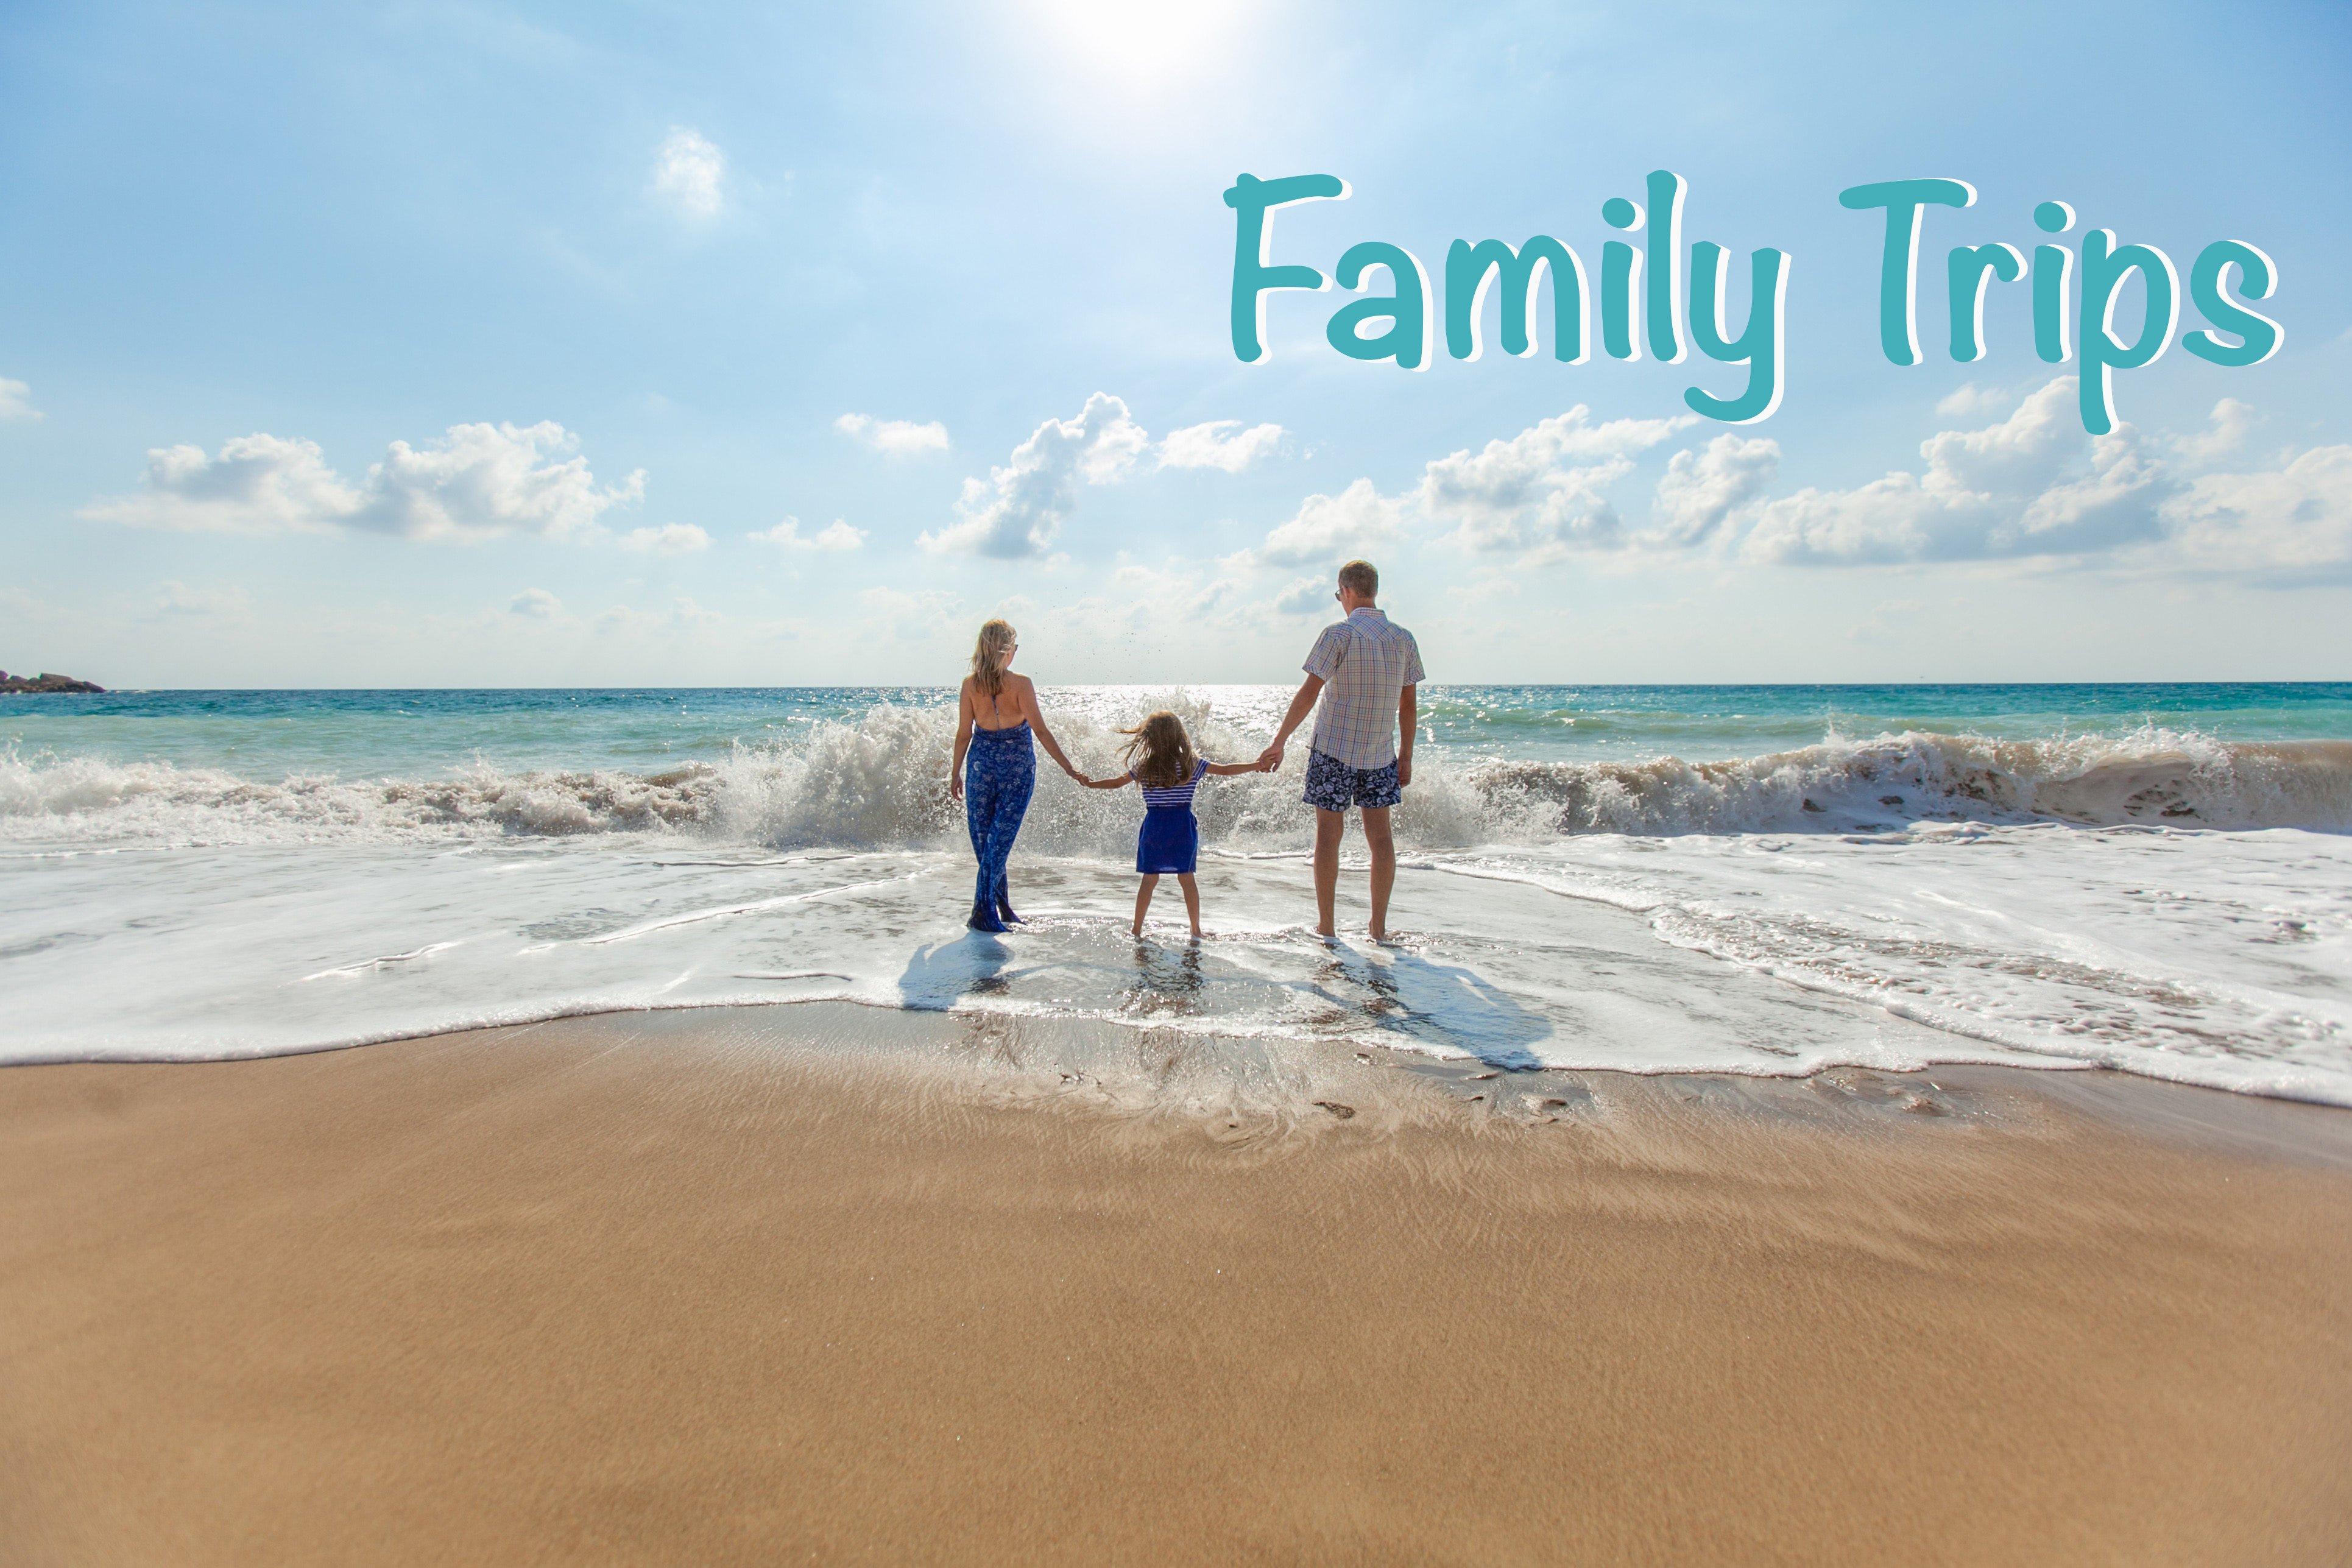 Family Trips – Go Blue Tours